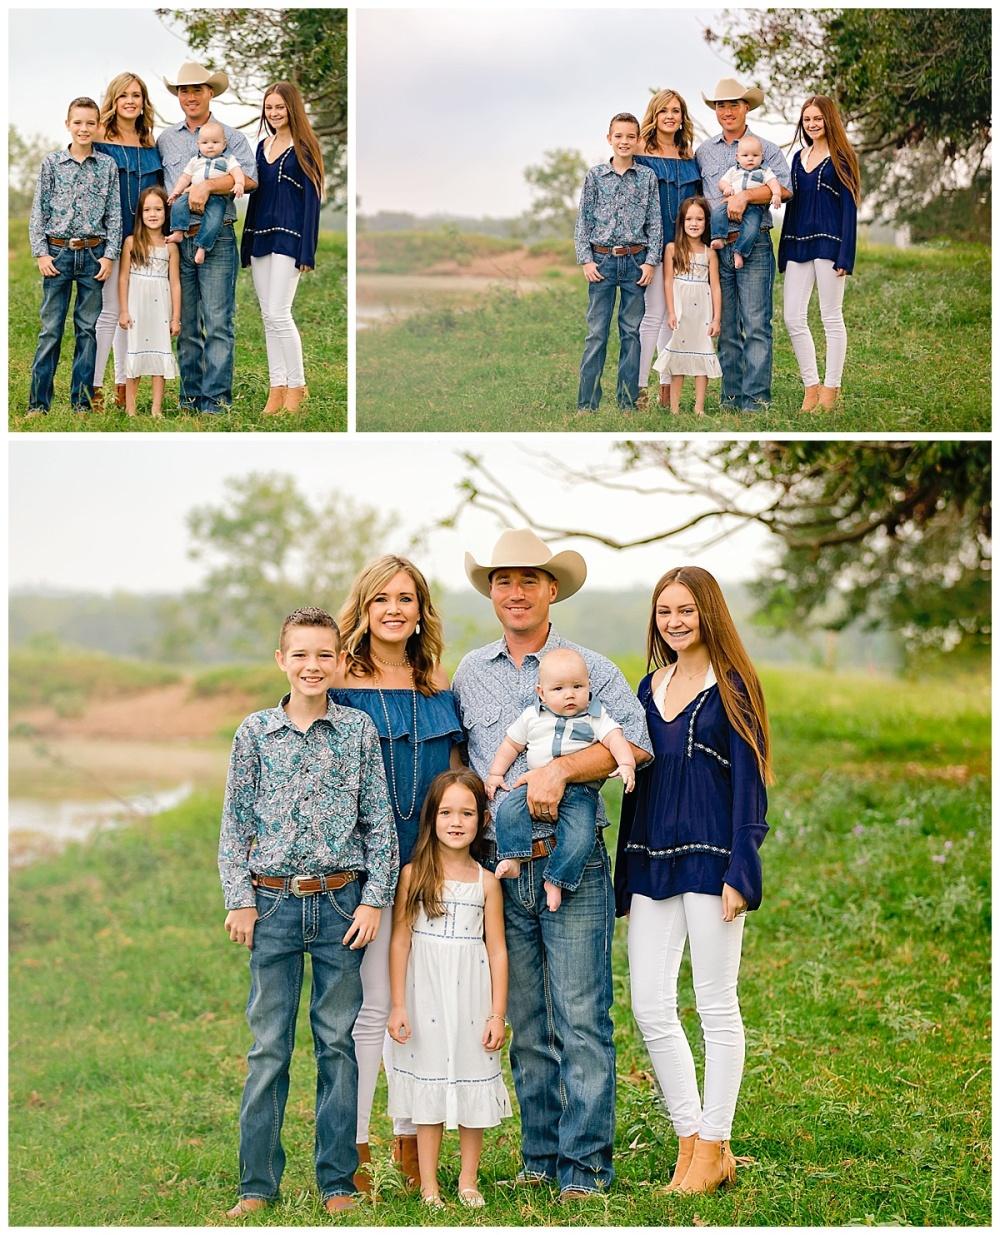 Carly-Barton-Photography-San-Antonio-Texas-Hill-Country-Fall-Heubaum_0026